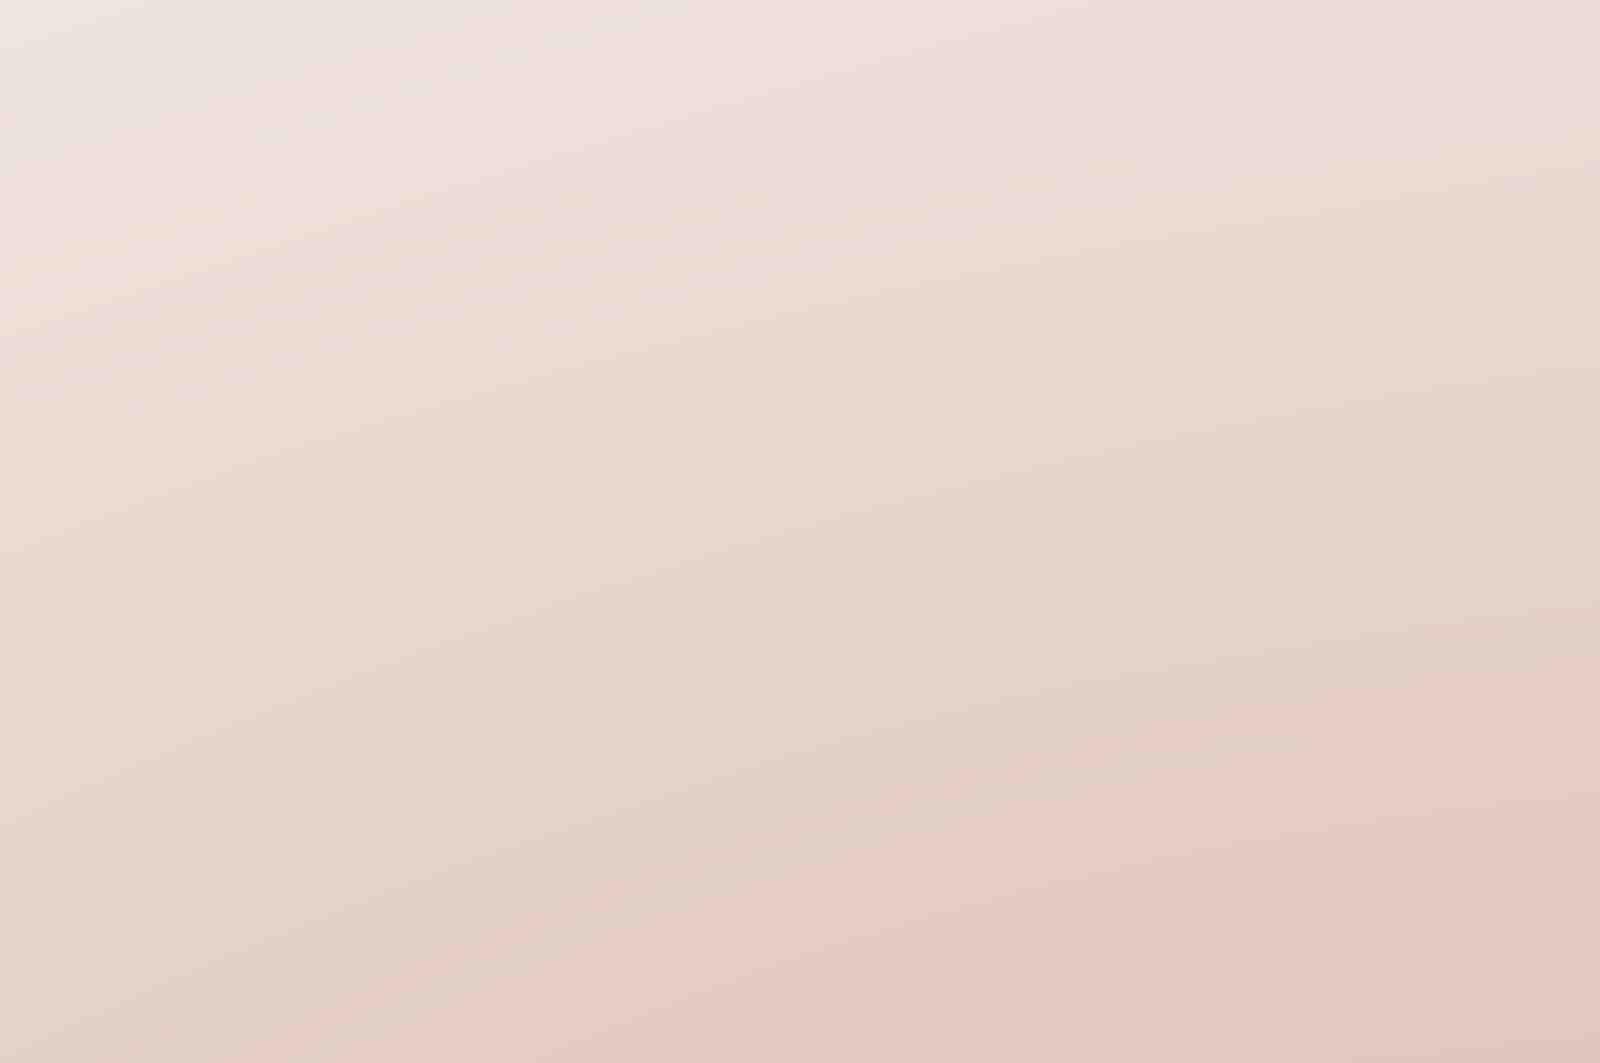 blog-image-04-min